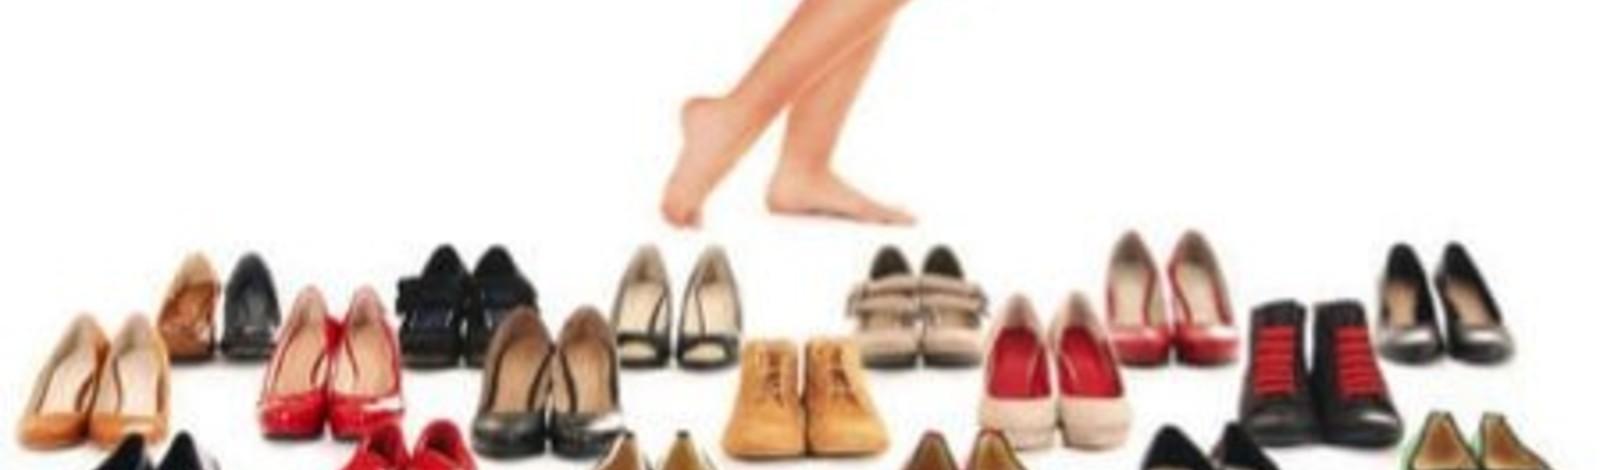 stabiele kwaliteit goedkoop kopen koop uitverkoop Welke schoenen onder jurkjes? - Jurkjes.com